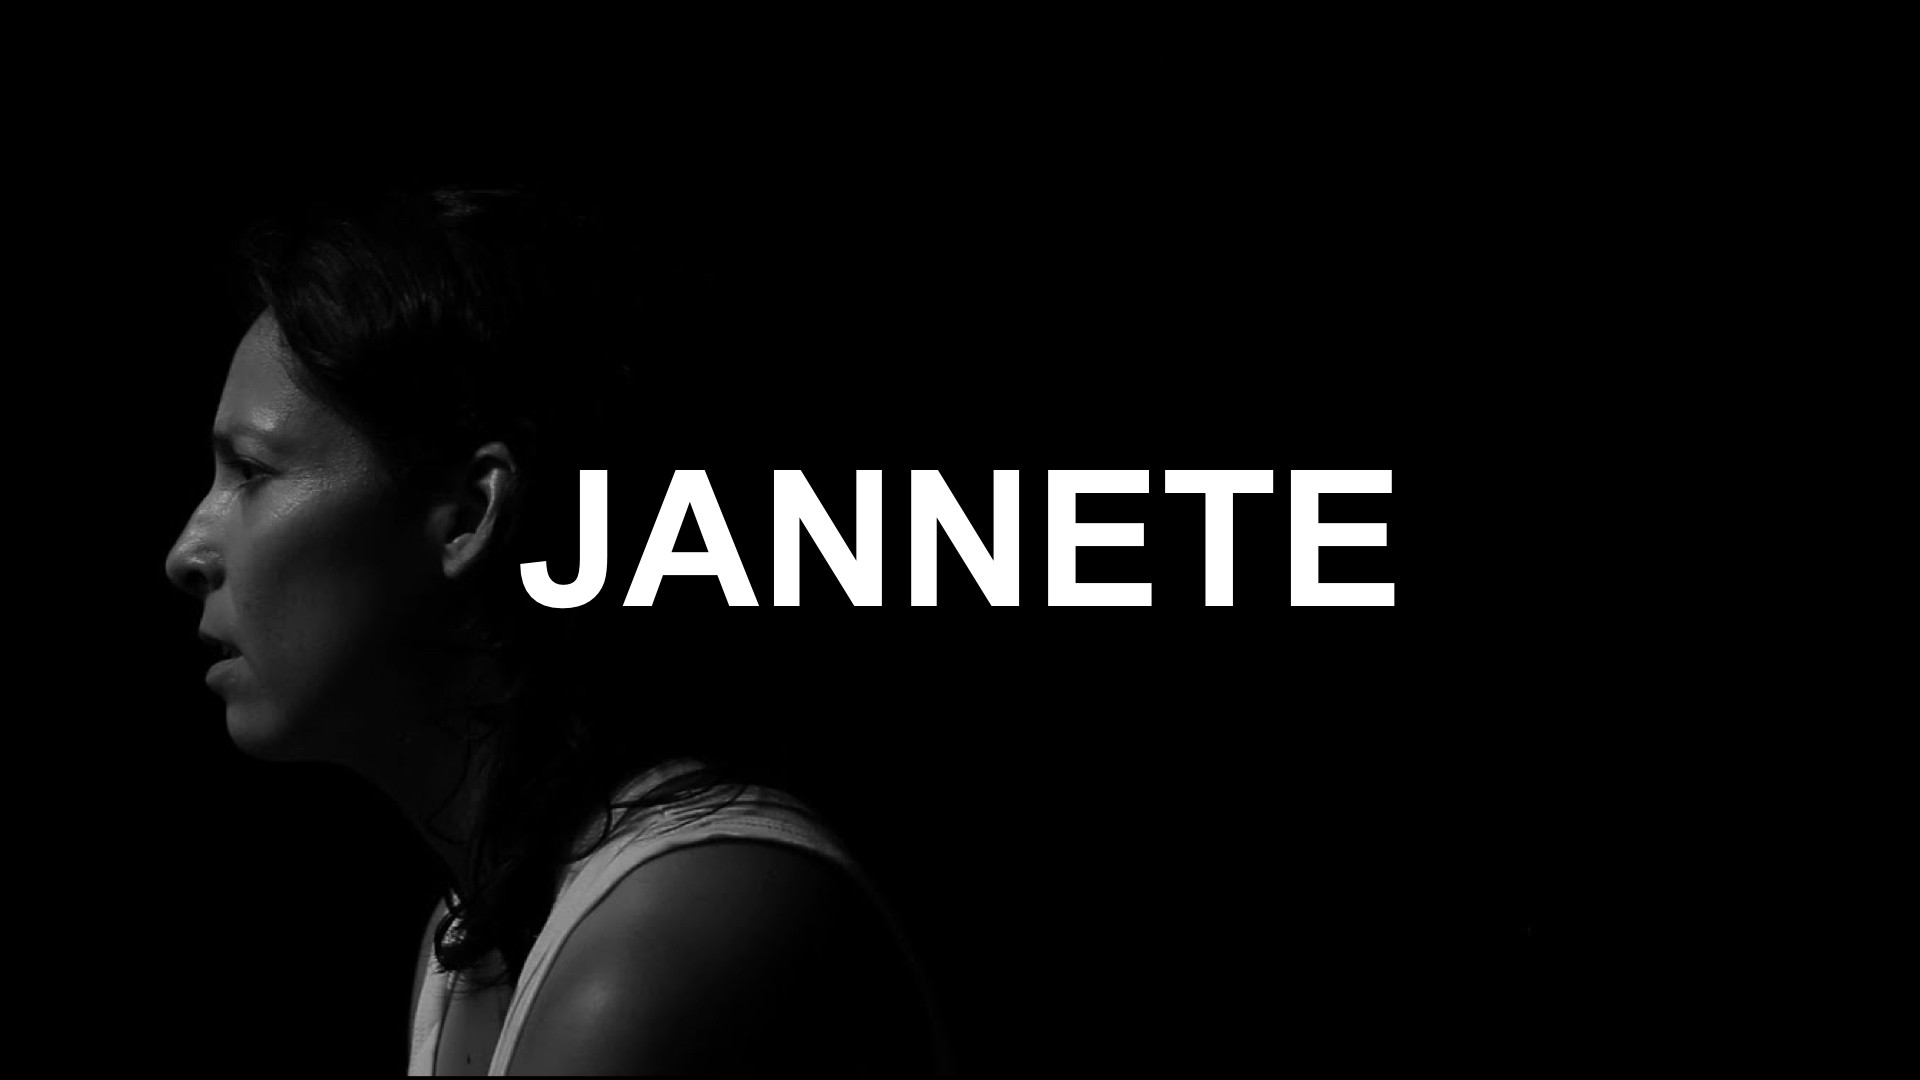 JANNETE